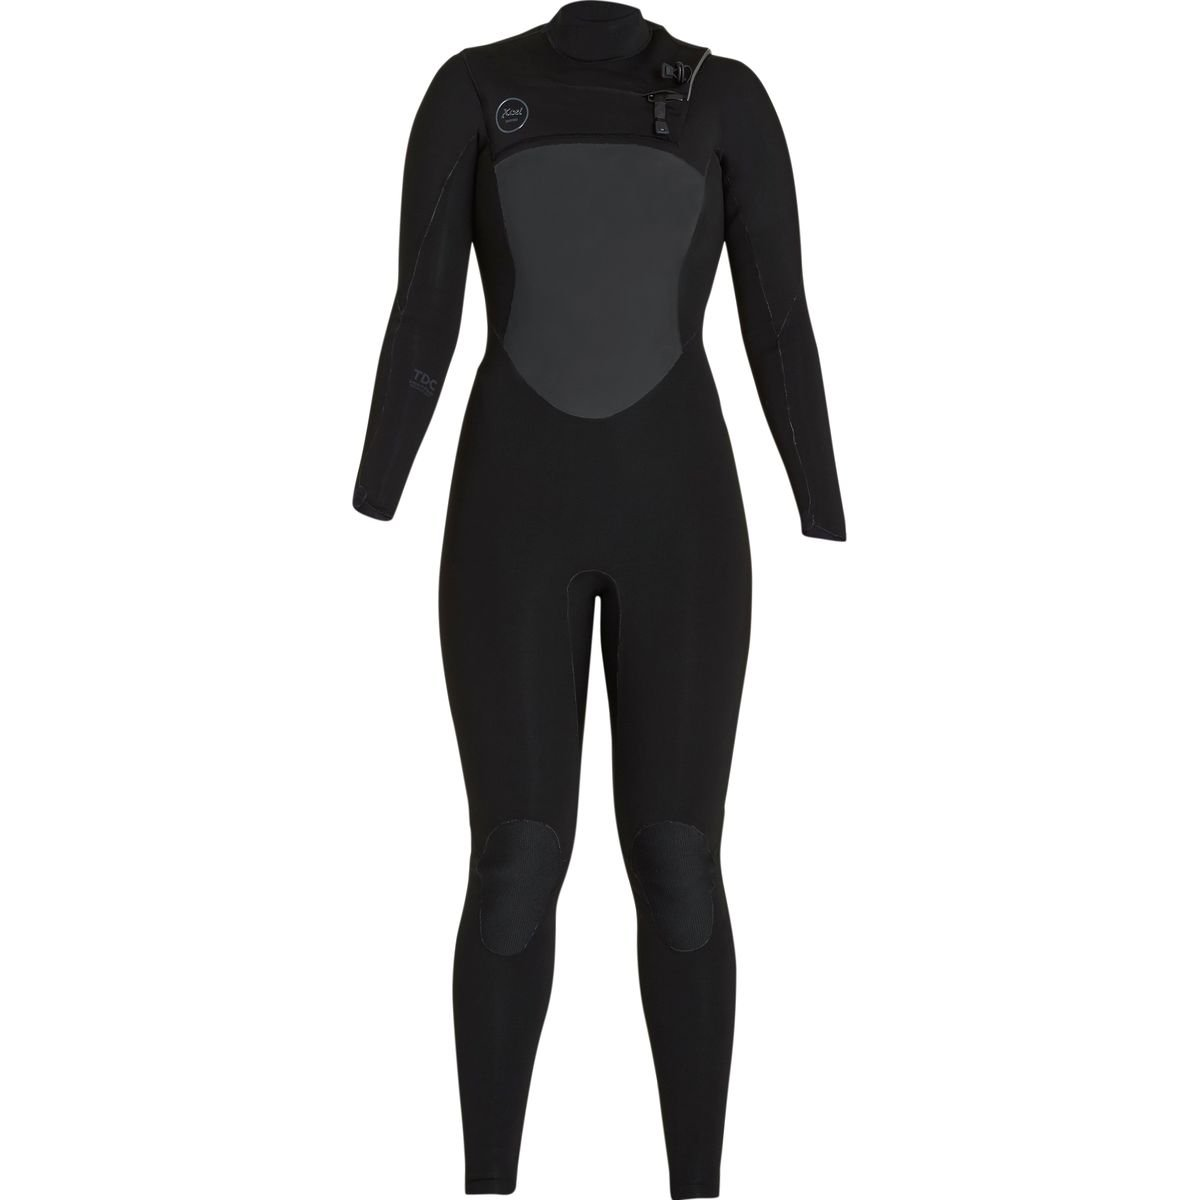 XcelハワイDrylock 3 / 2 mm TDC Full Wetsuit – Women 's B0793171RY 10S|Black/Black Logos Black/Black Logos 10S